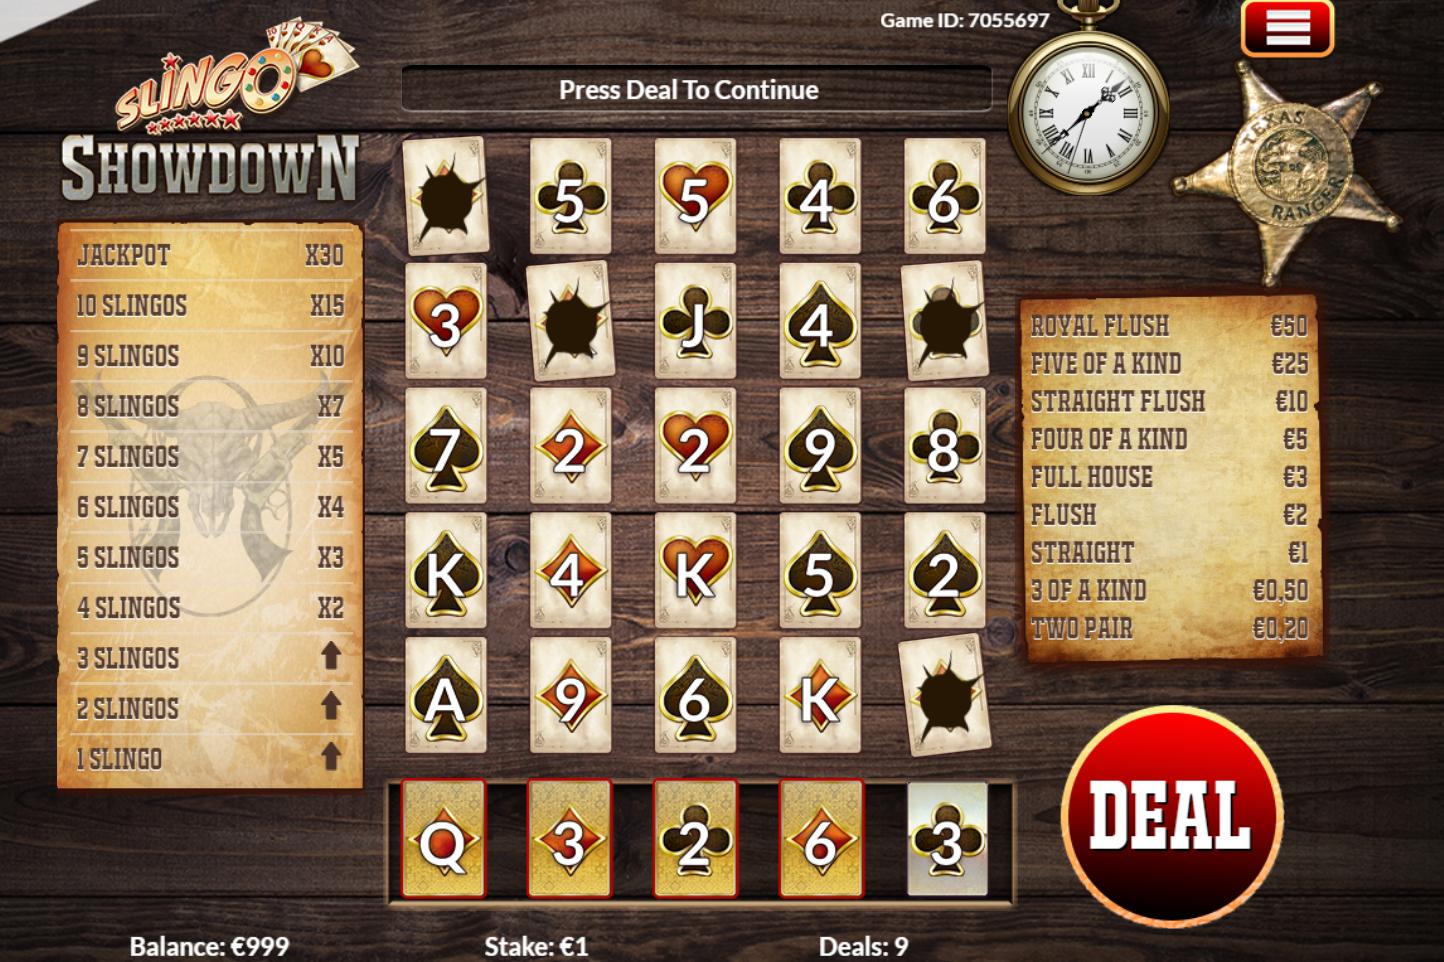 slingo showdown saloon sheriff star bermain kartu